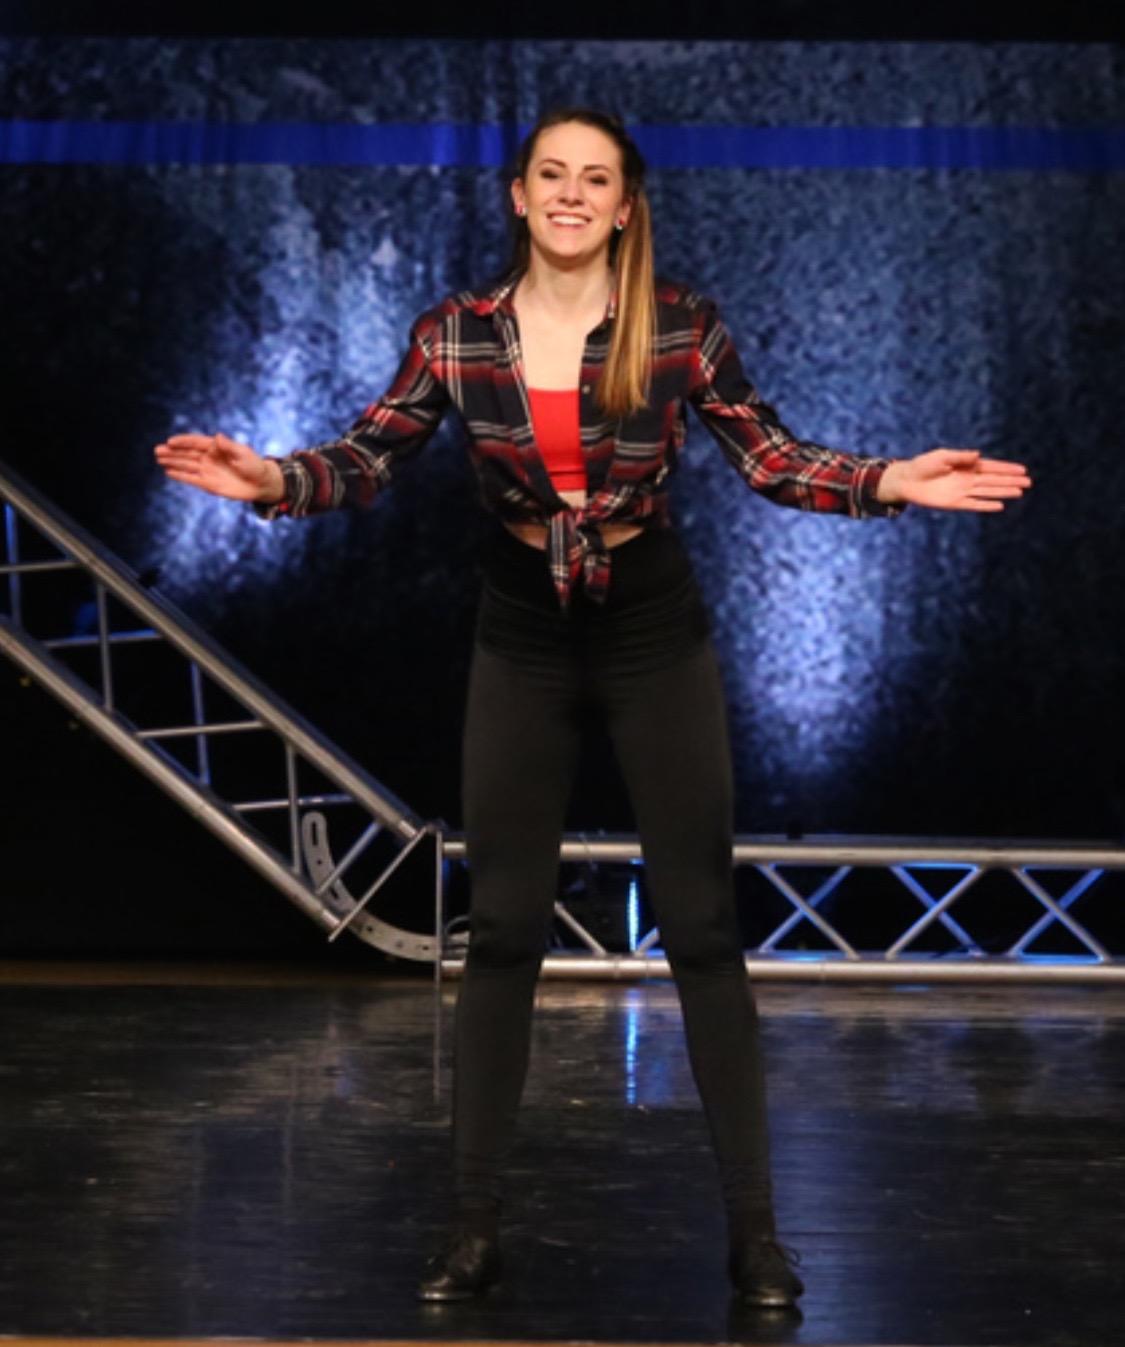 Hannah solo 2017